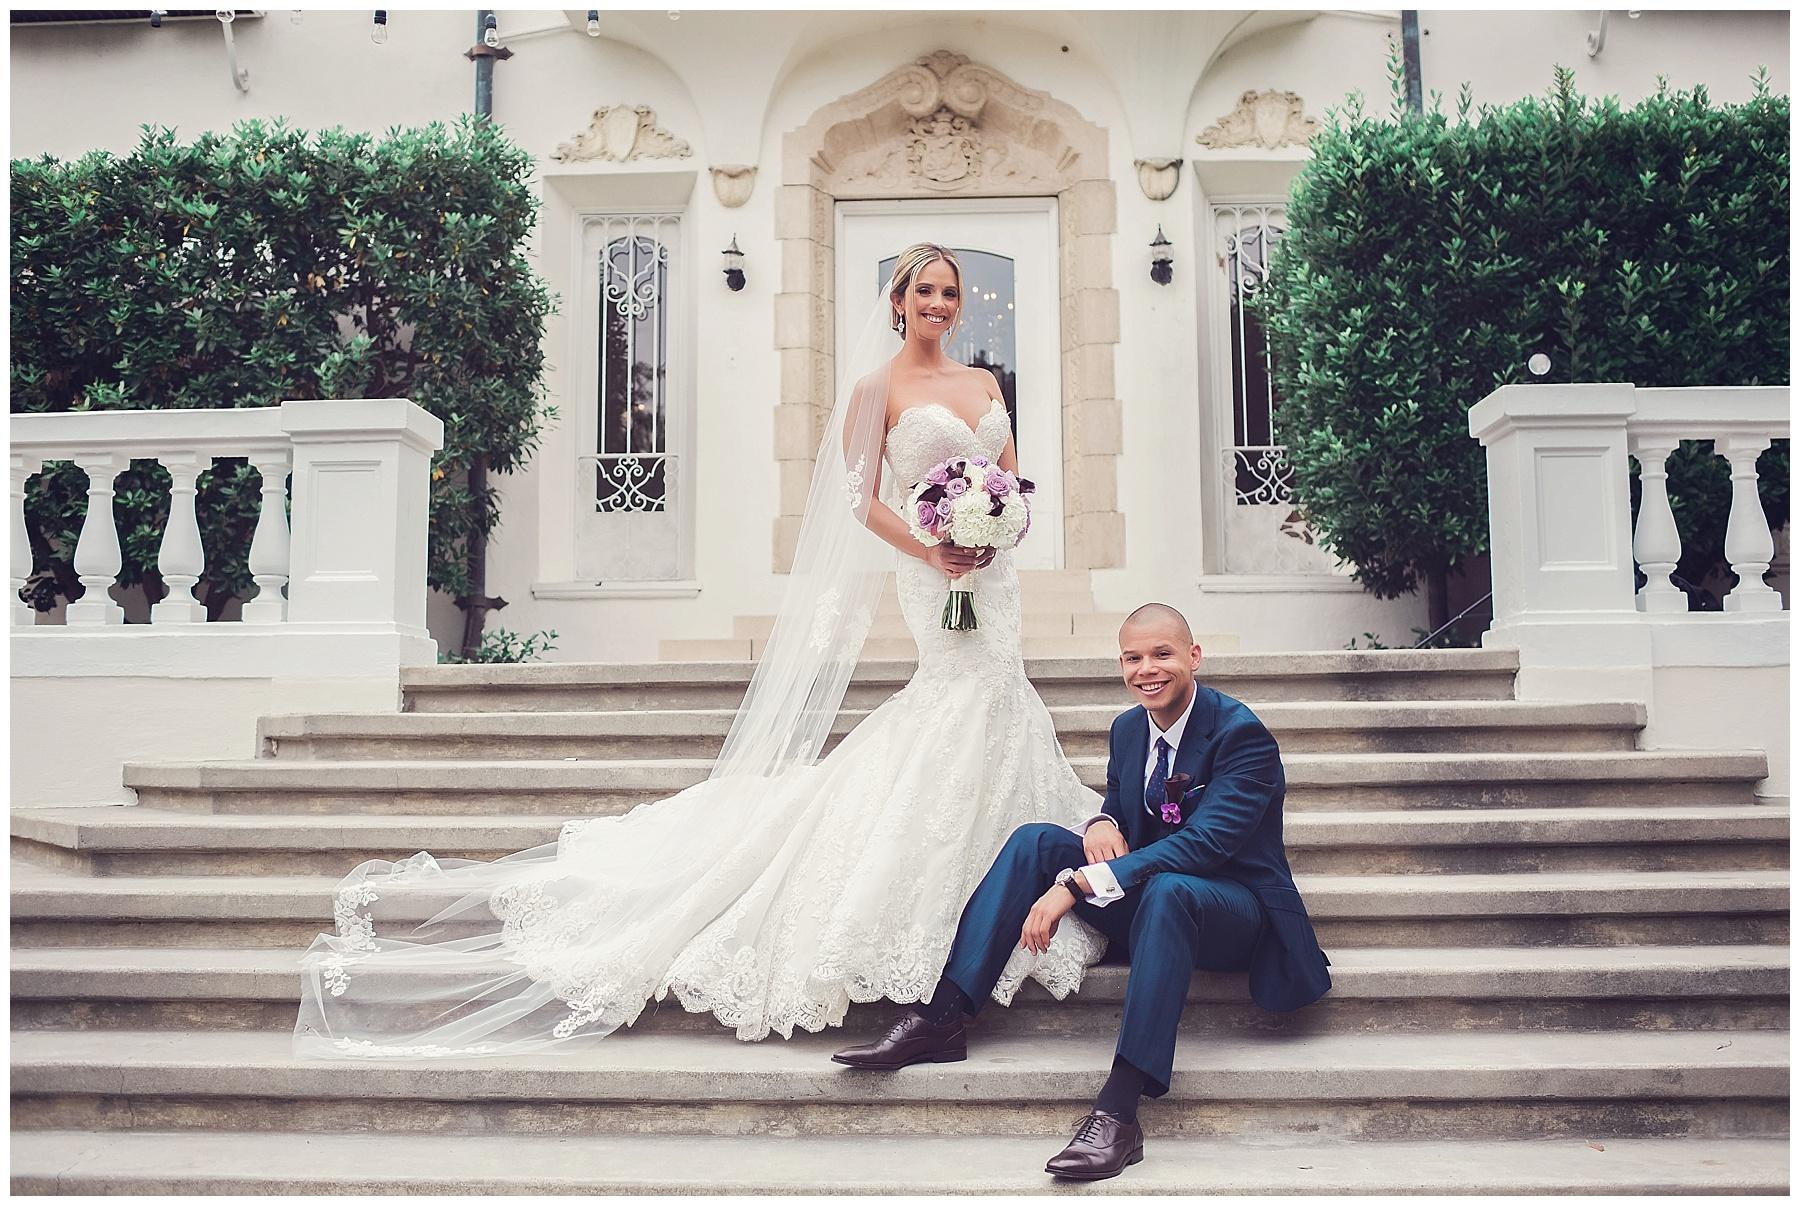 Wedding Photography Pasadena Ca: Ambassador Mansion Wedding